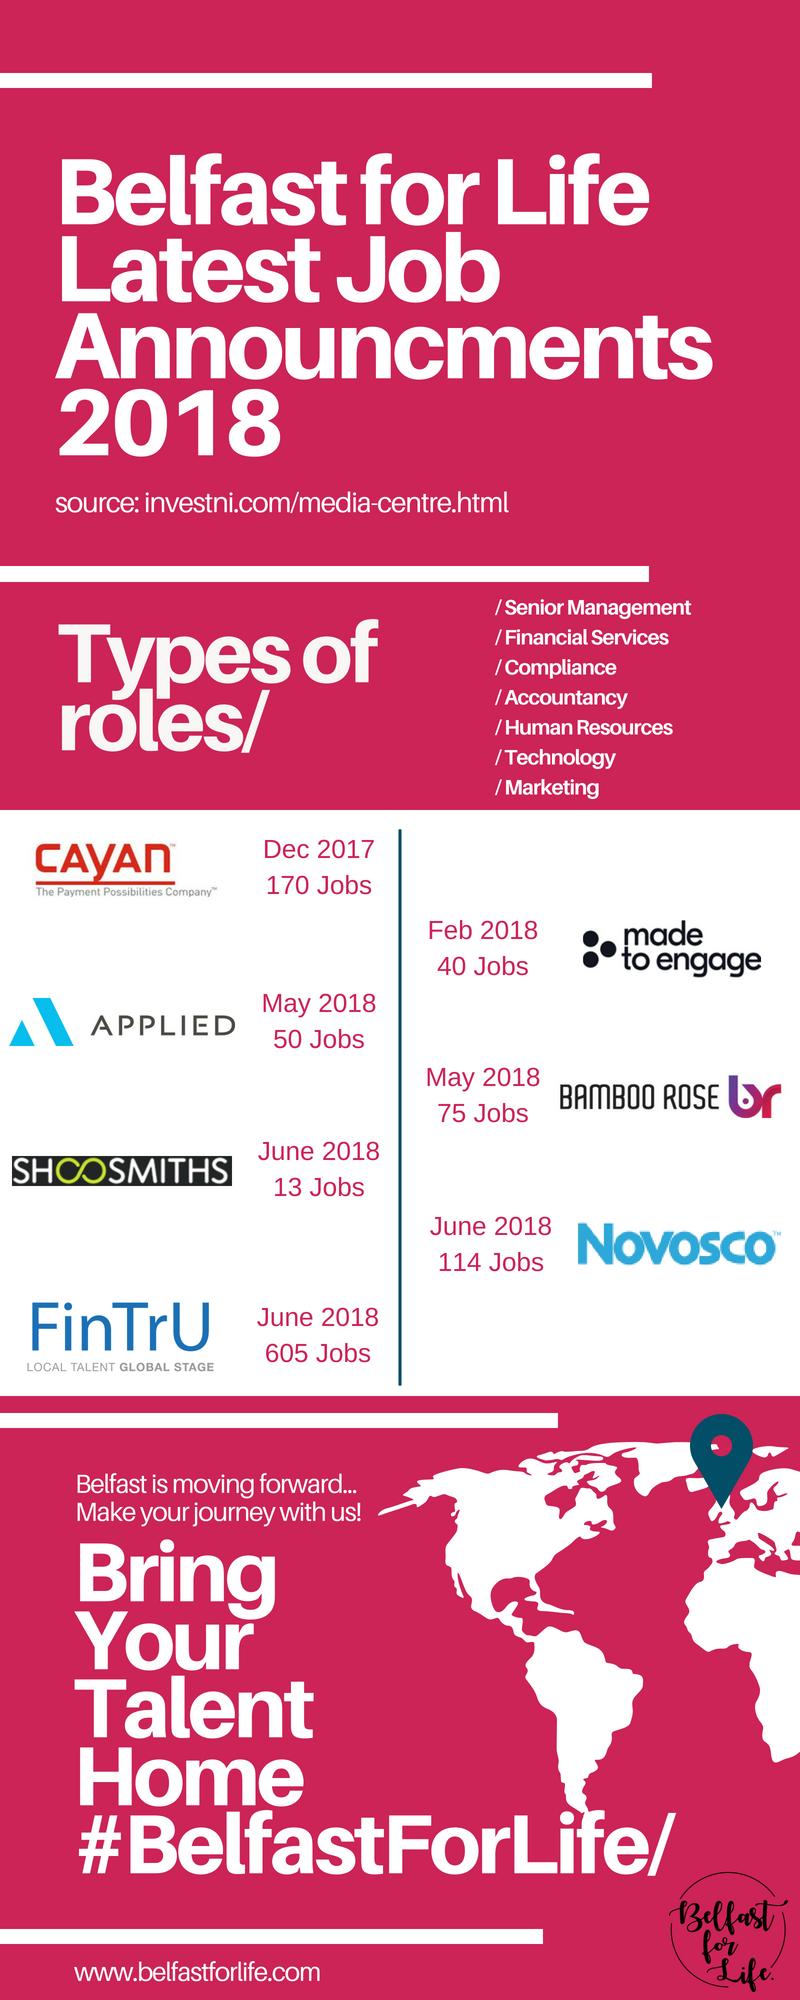 Belfast Job Announcements 2018